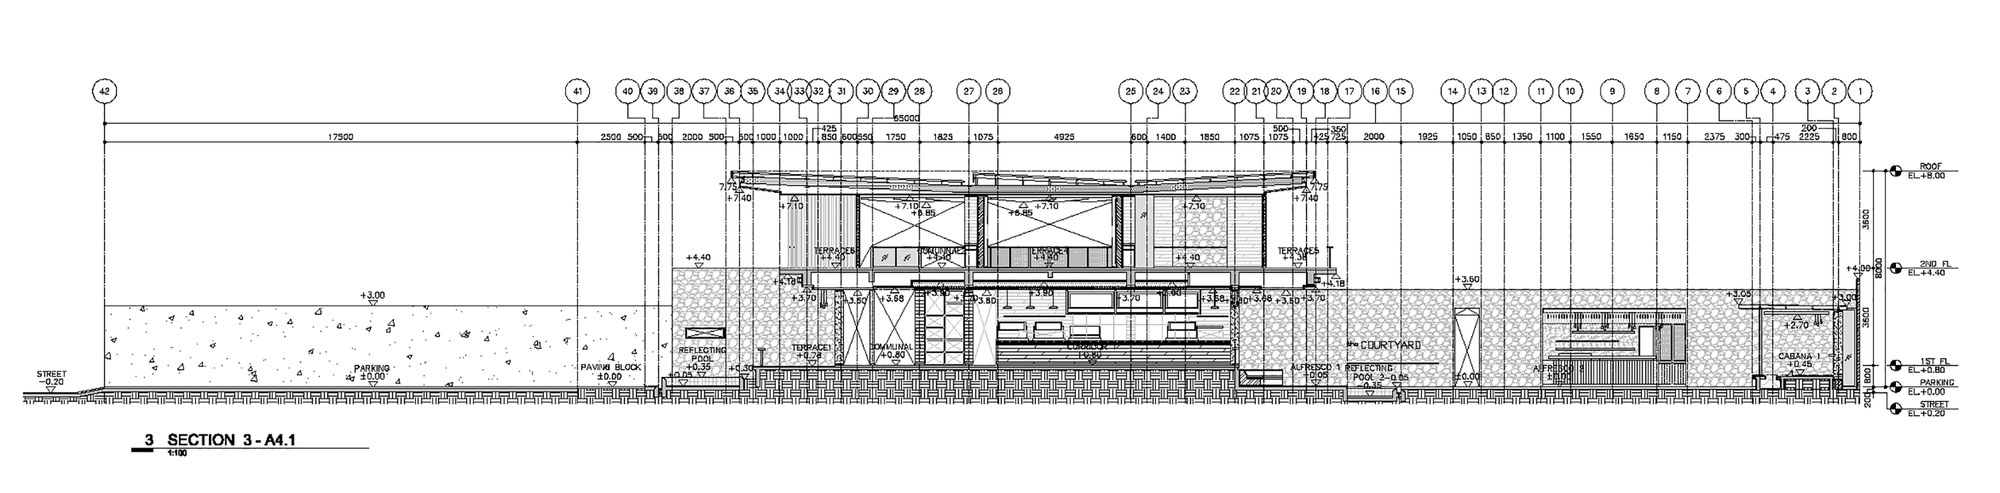 Stylish Tropical Paradise Theme of Lemongrass Restaurant Designed by Einstein & Associates-29